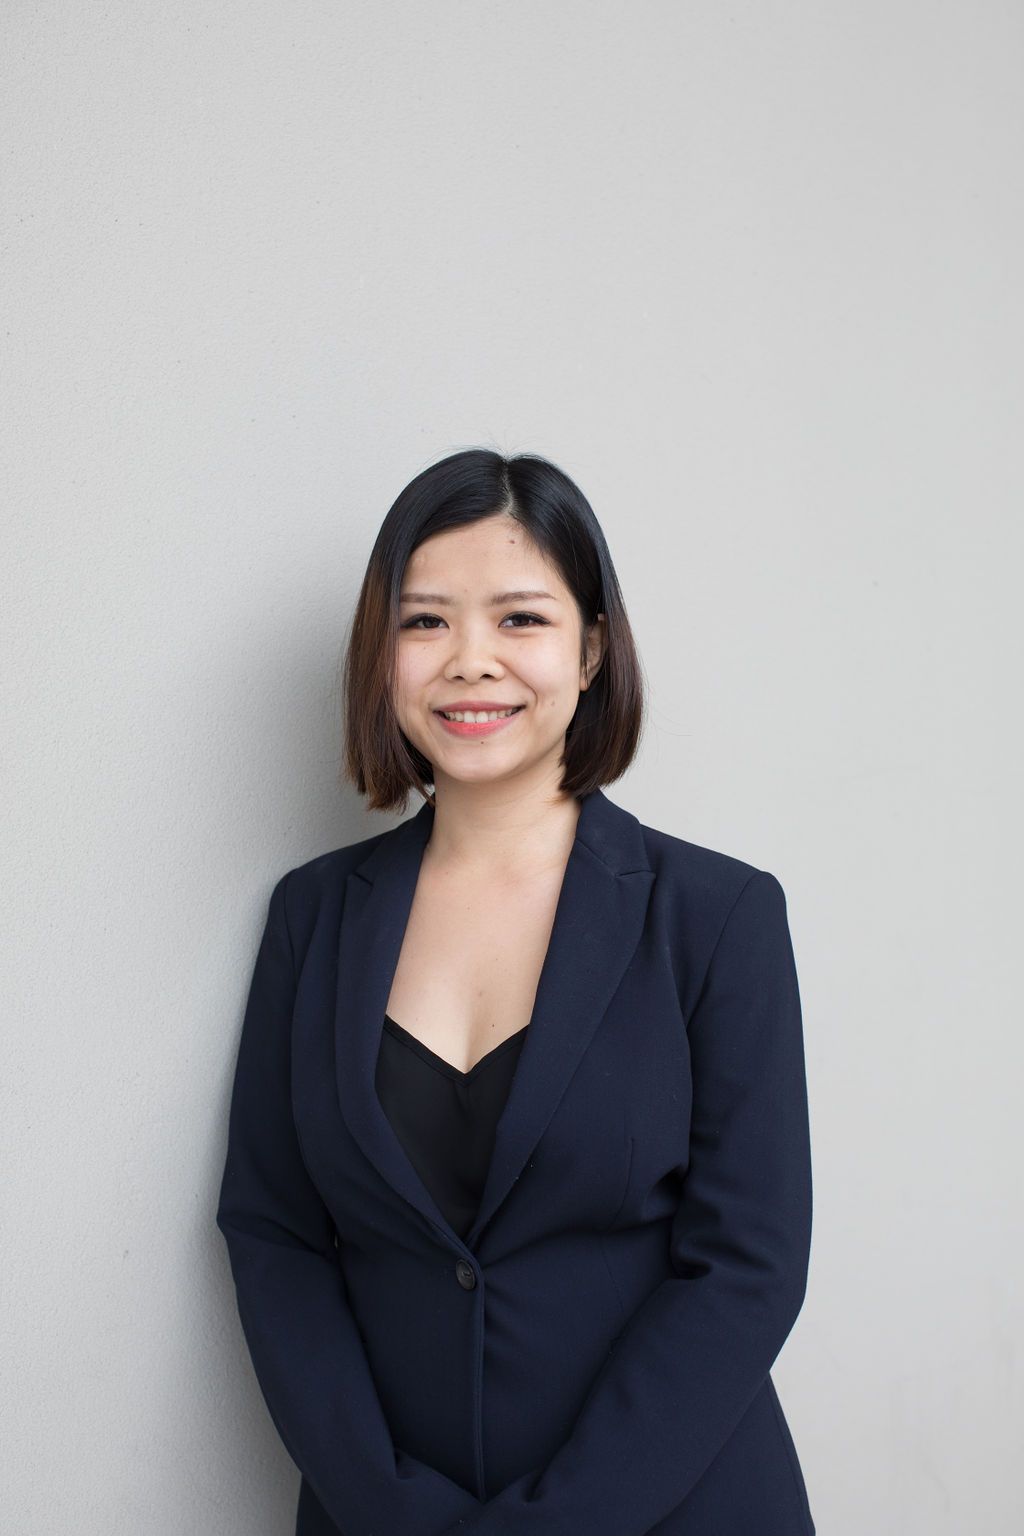 Jinny Bui